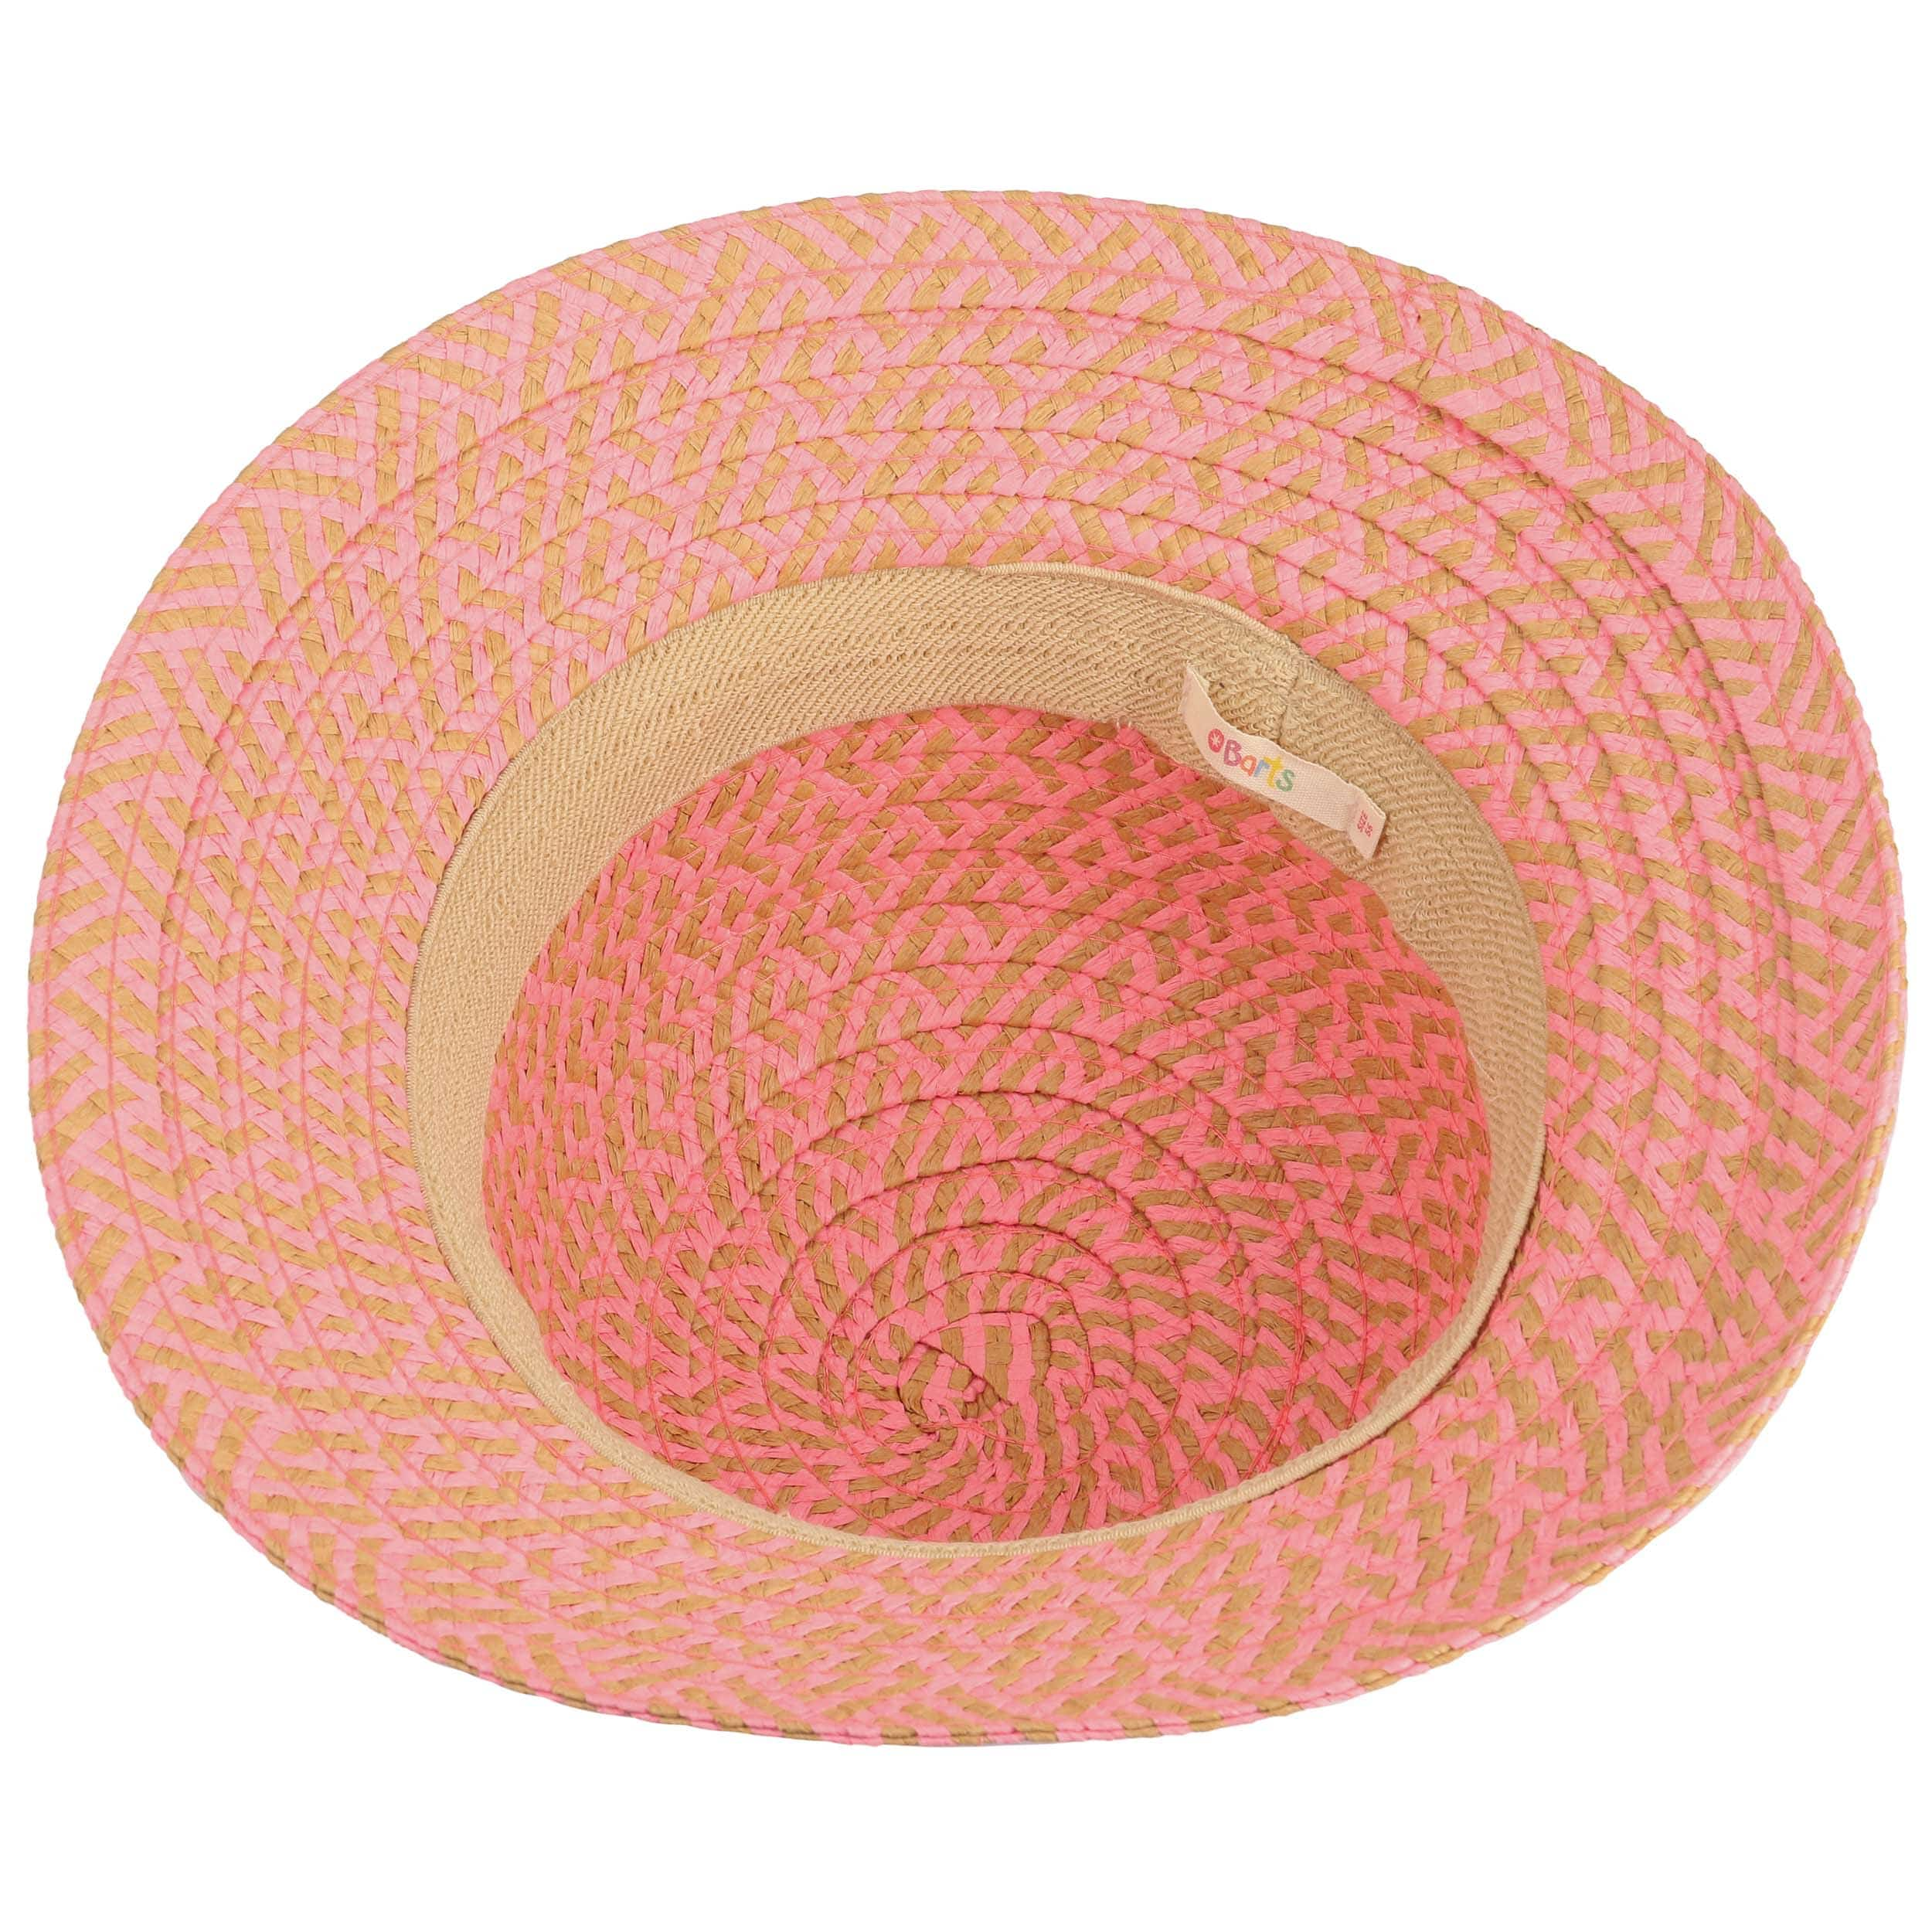 42a057f365c ... Havana Girls Summer Hat by Barts - rose 2 ...